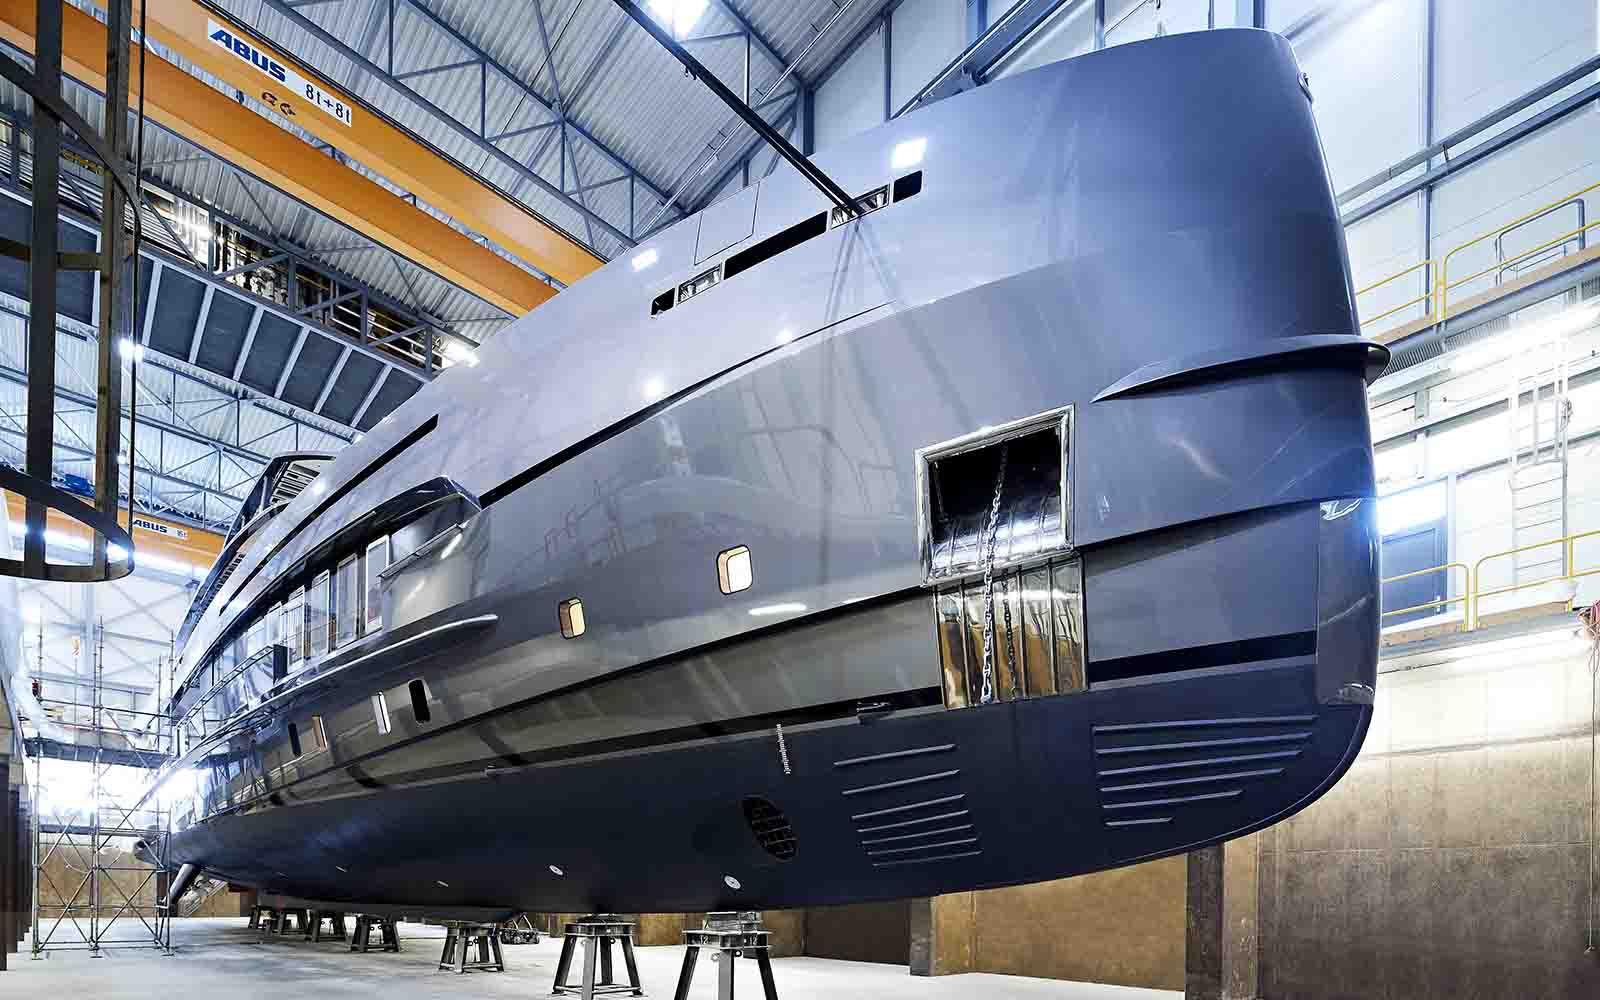 heesen superiate project boreas - boat shopping 4